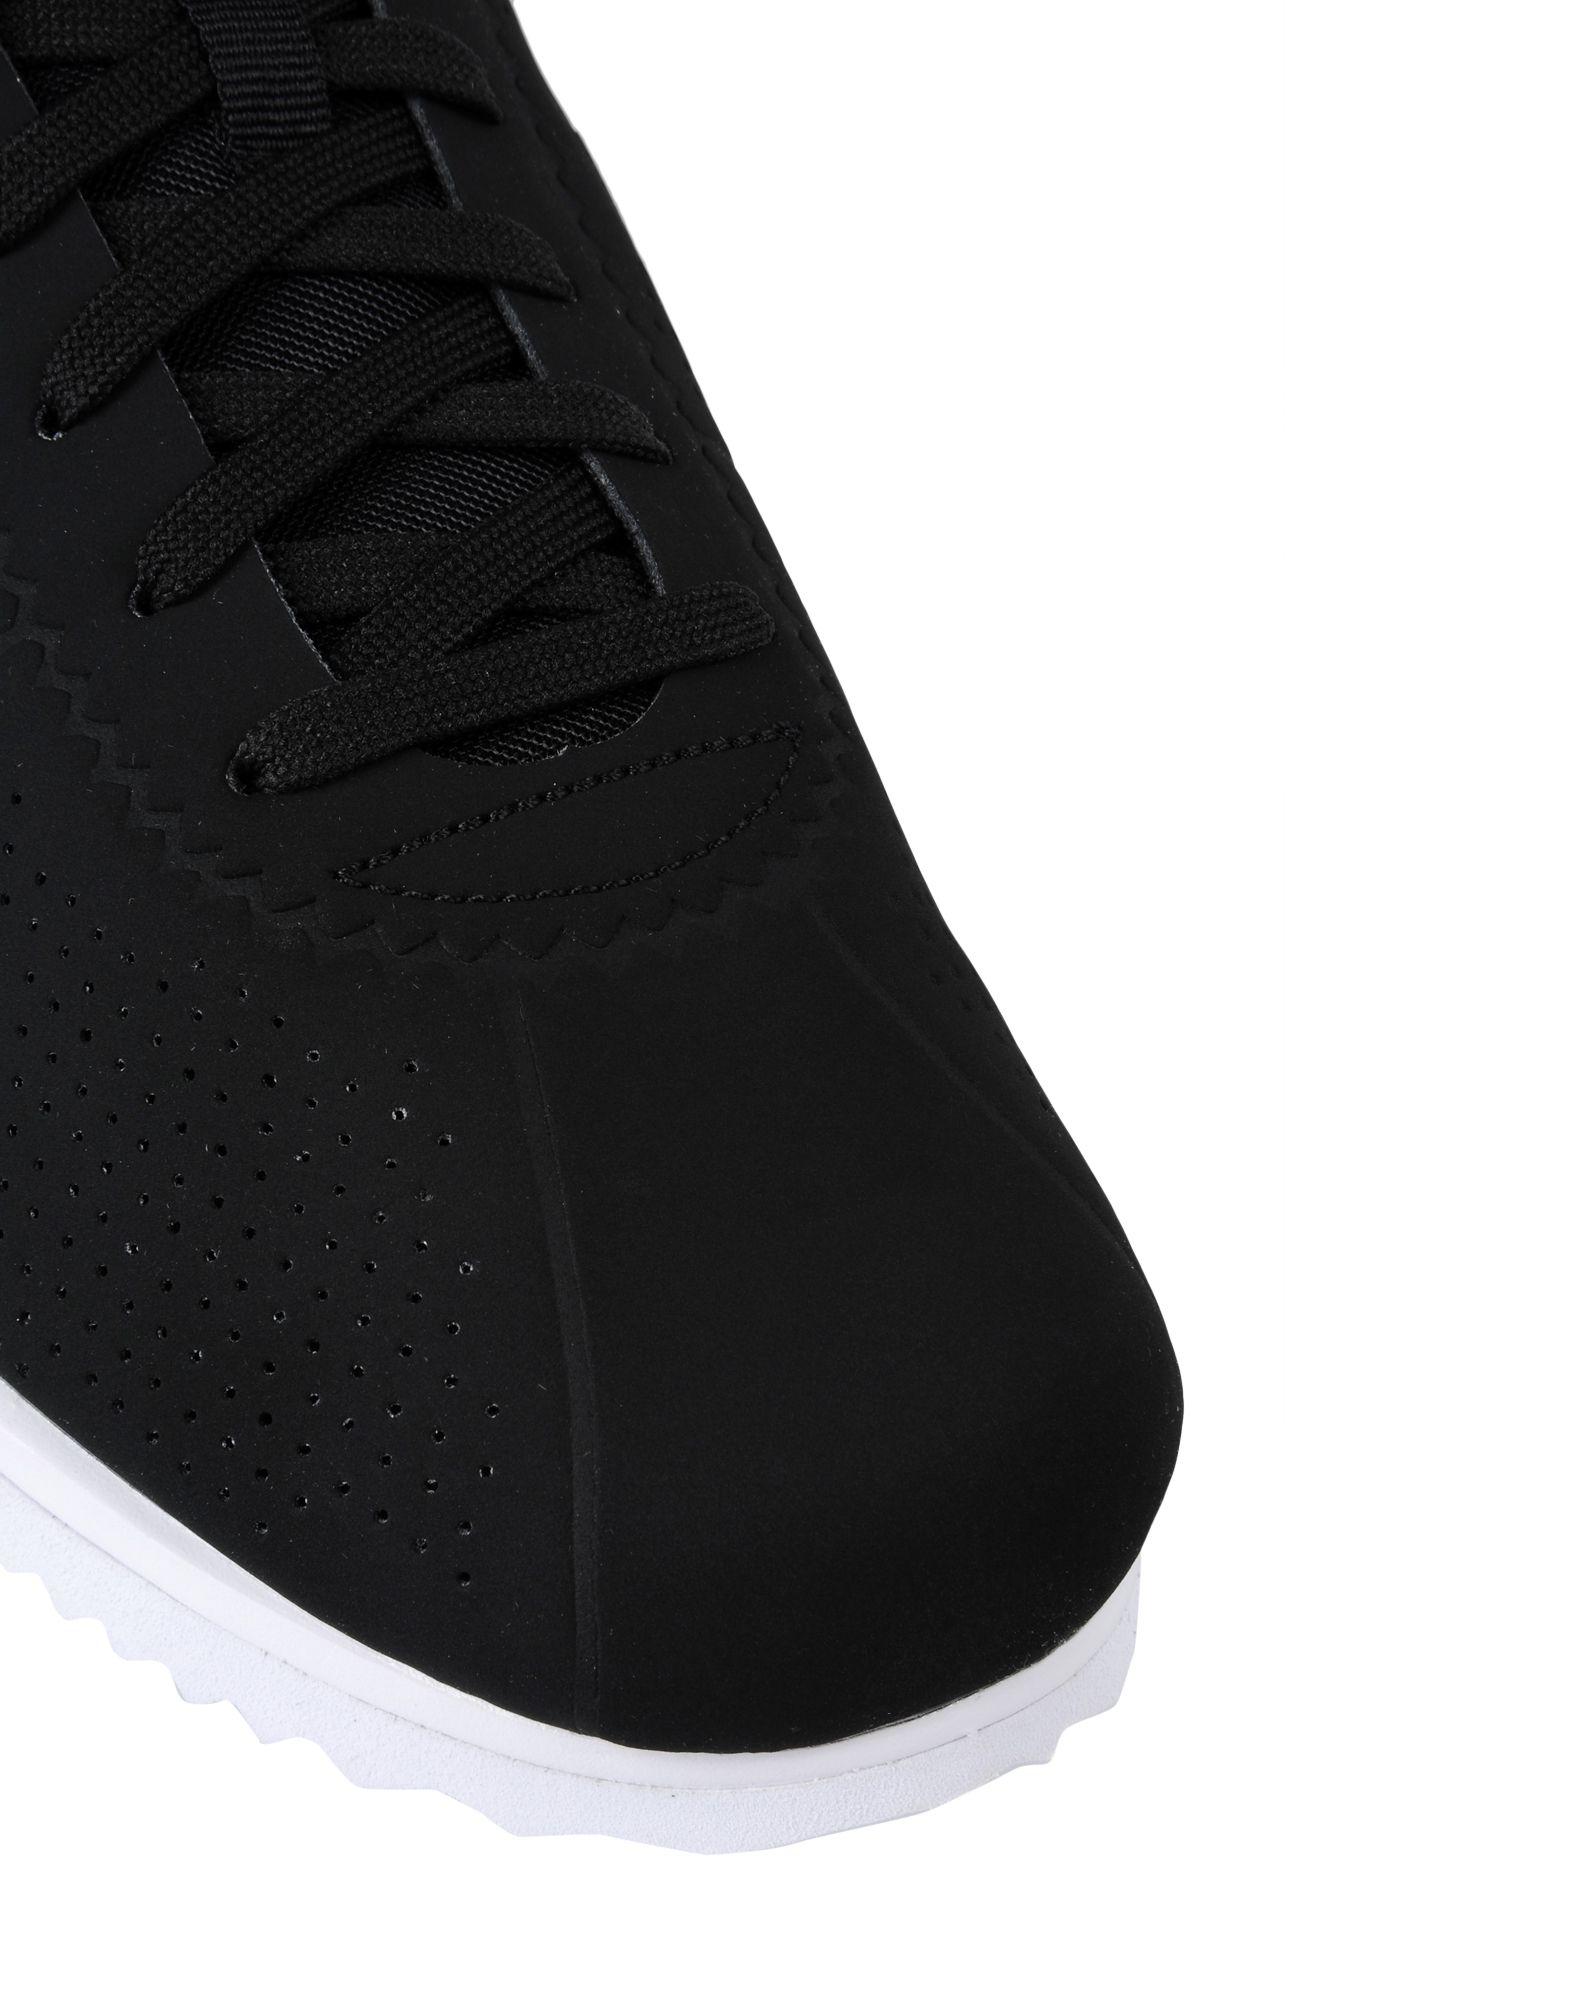 Sneakers Nike  Cortez Ultra Moire - Homme - Sneakers Nike sur